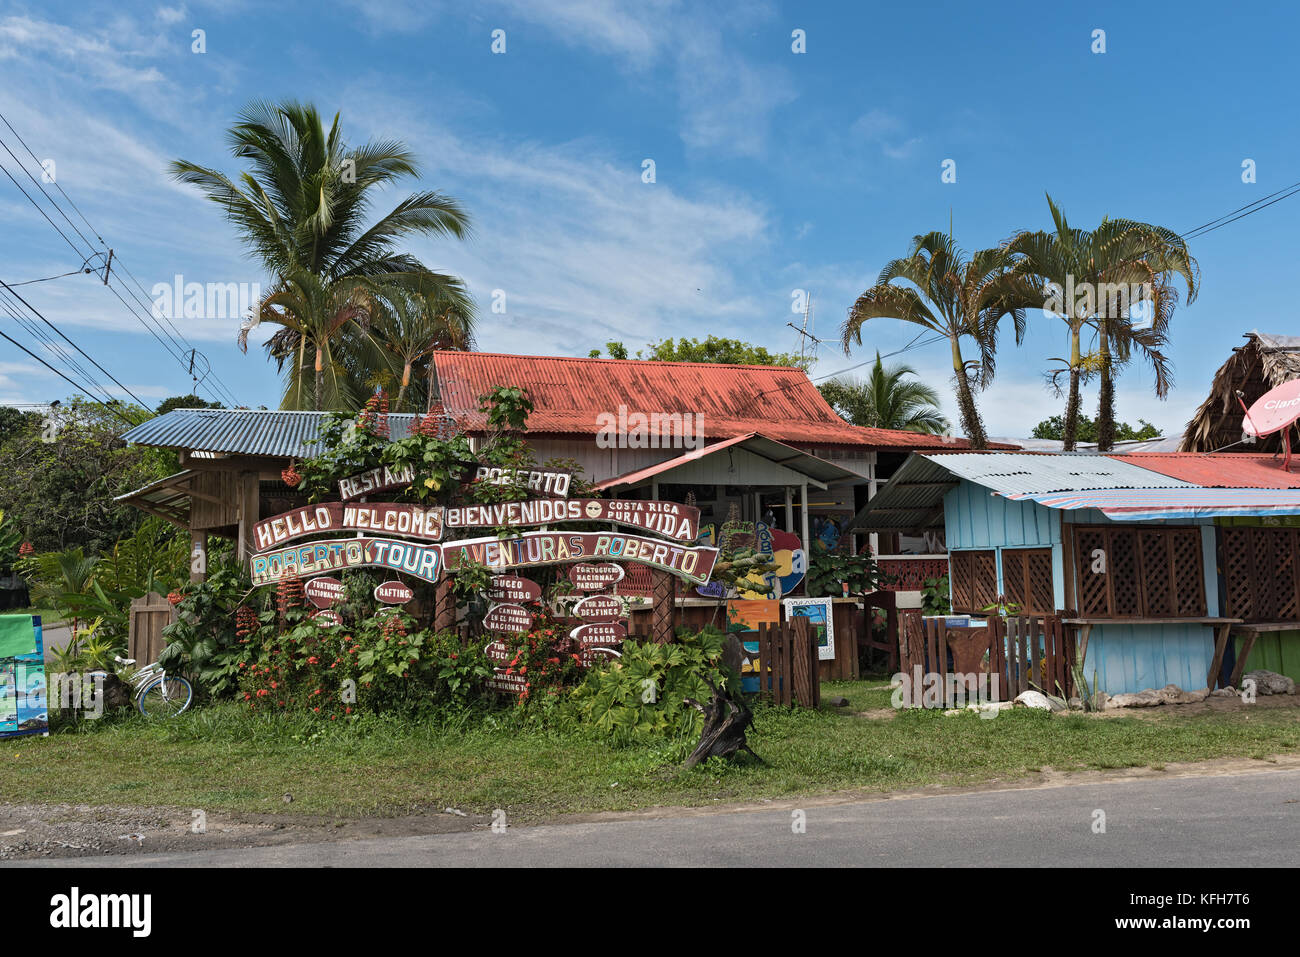 Colorful wooden house in Puerto Viejo de Talamanca, costa rica - Stock Image